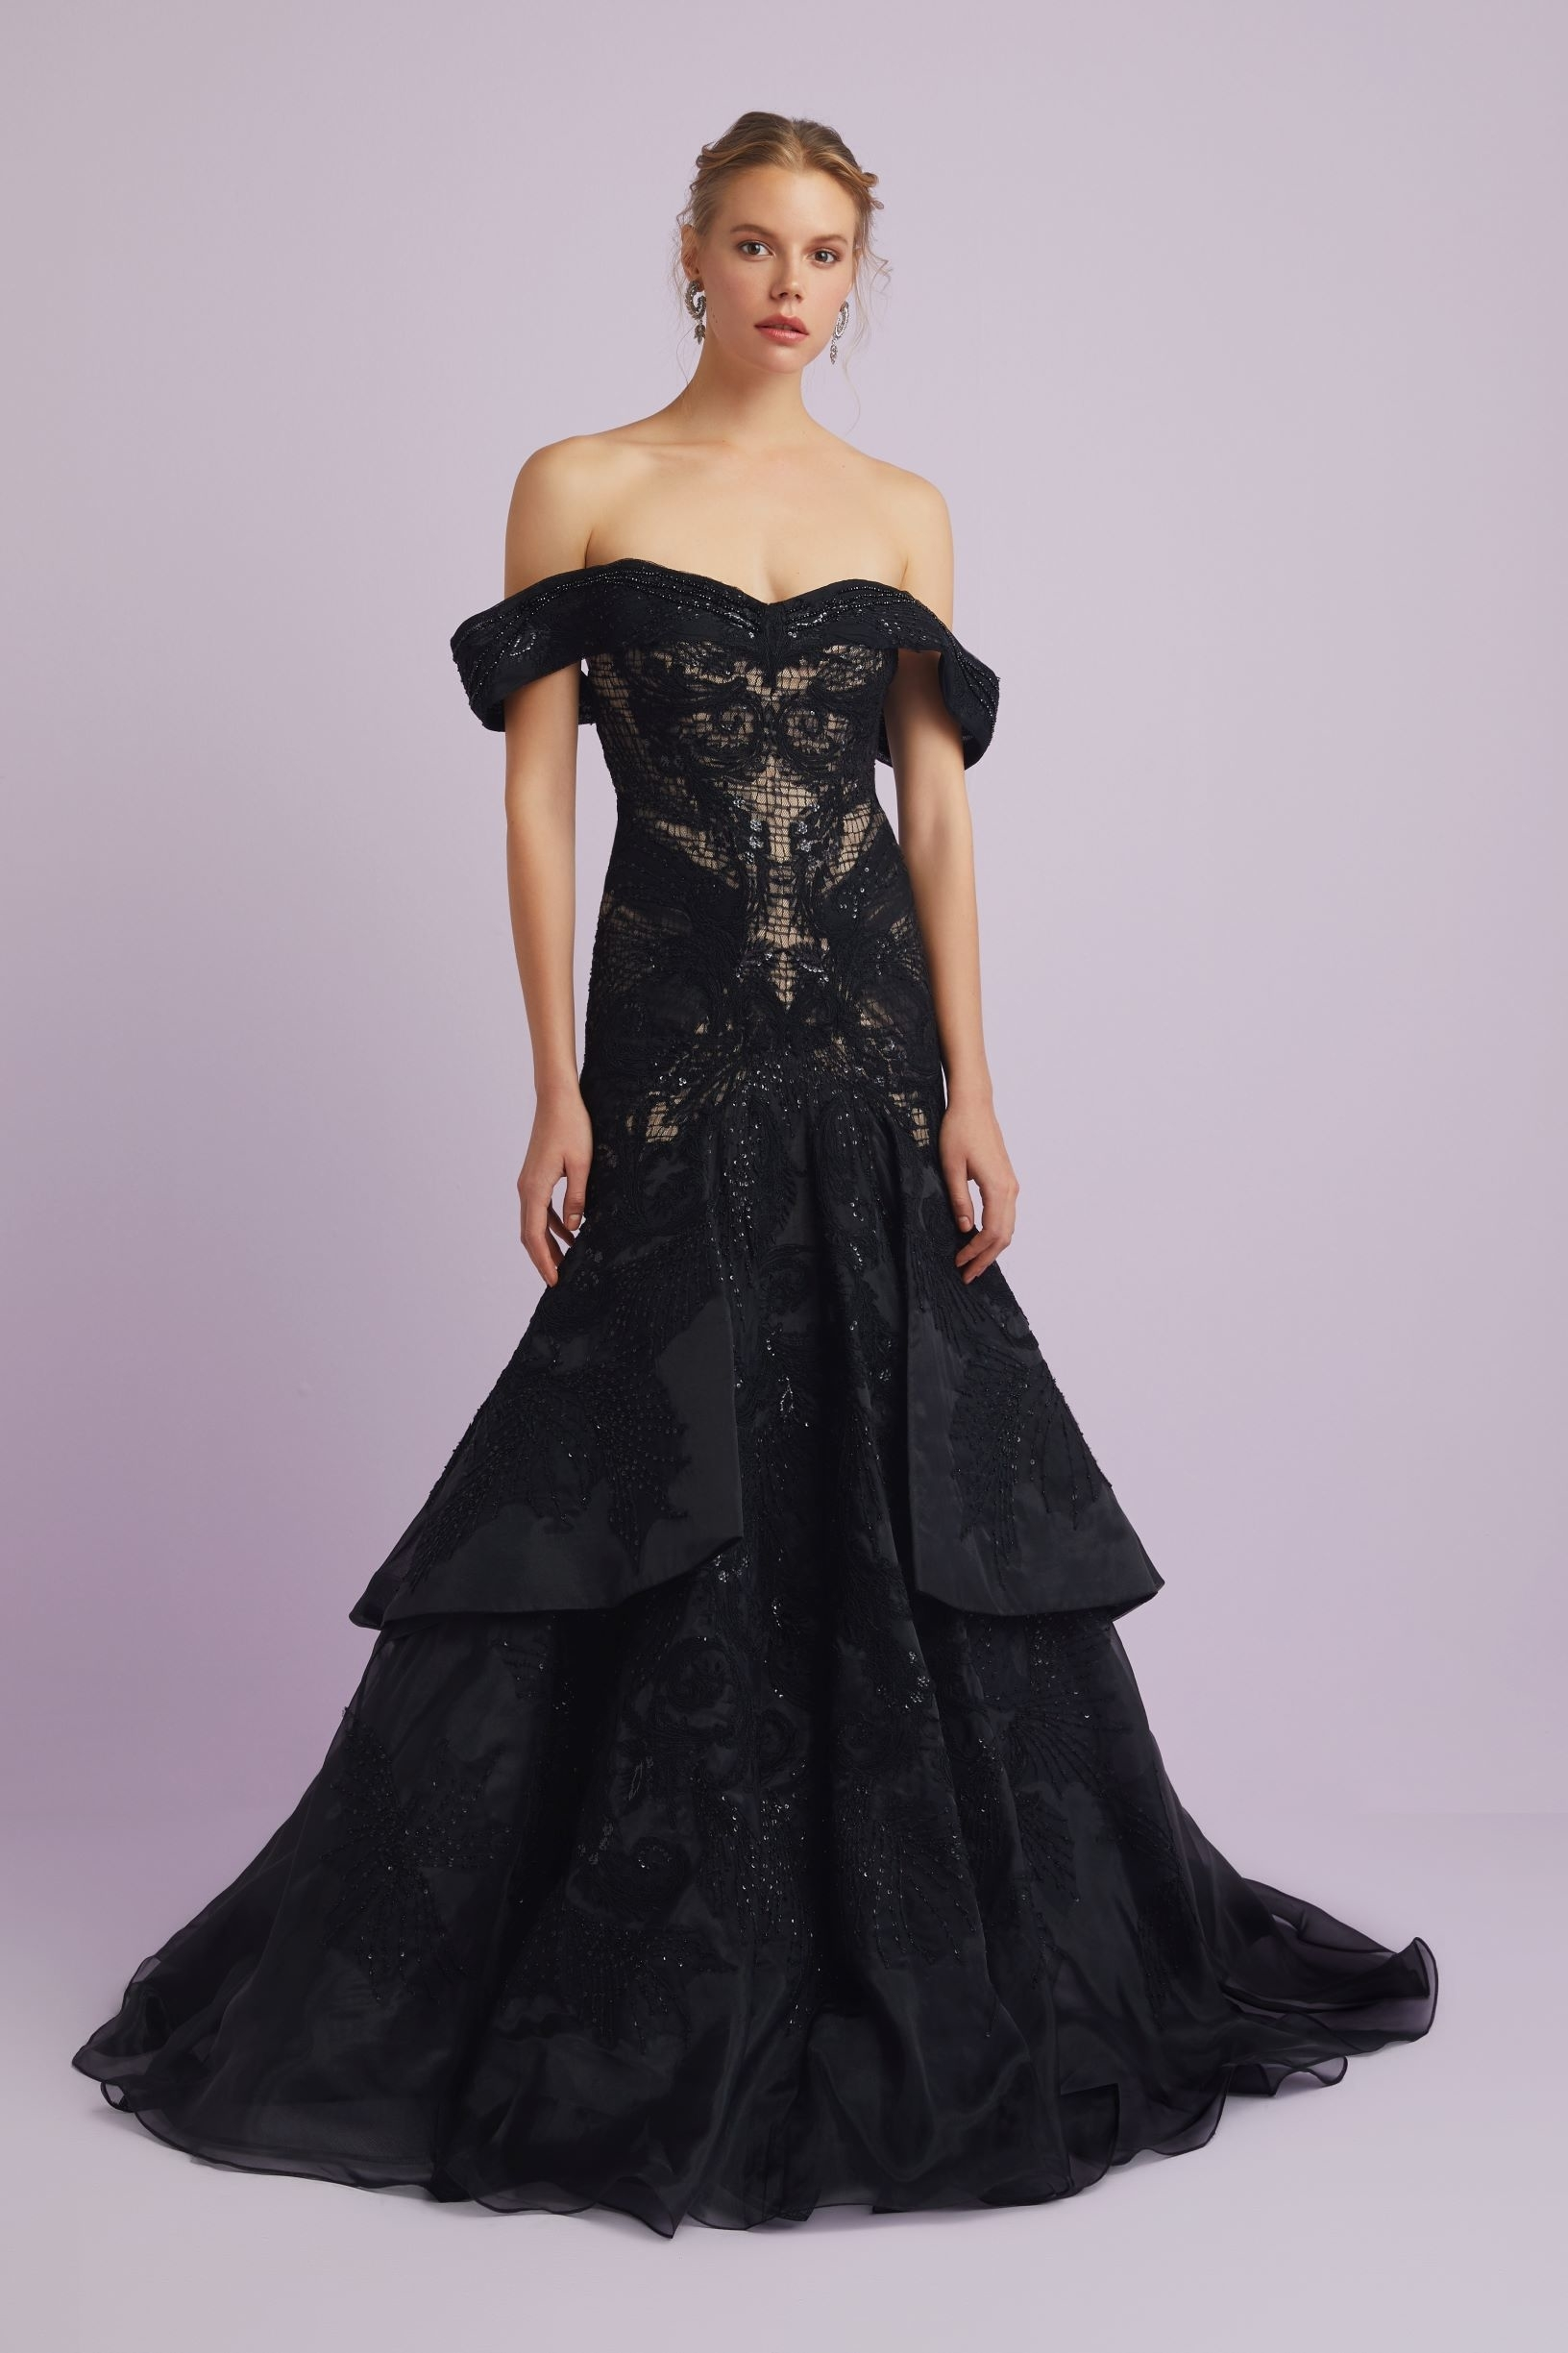 7ee3a163e80a1 Siyah Dantel İşlemeli Abiye Elbise – Oleg Cassini